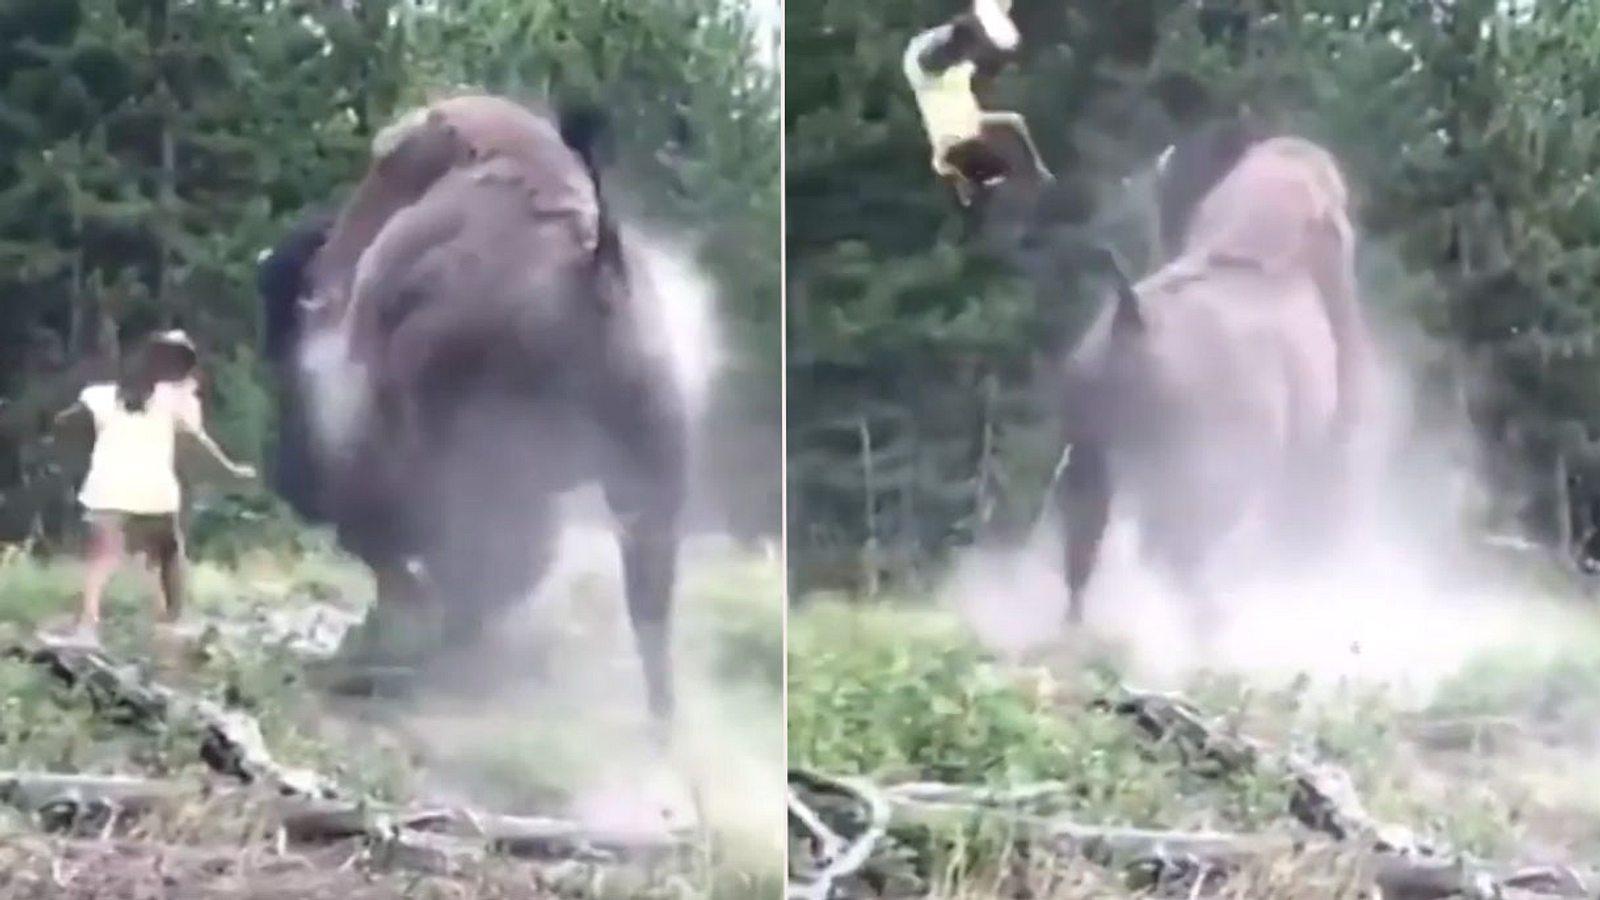 Bison rammt Mädchen per Büffel-Bombe in andere Dimension